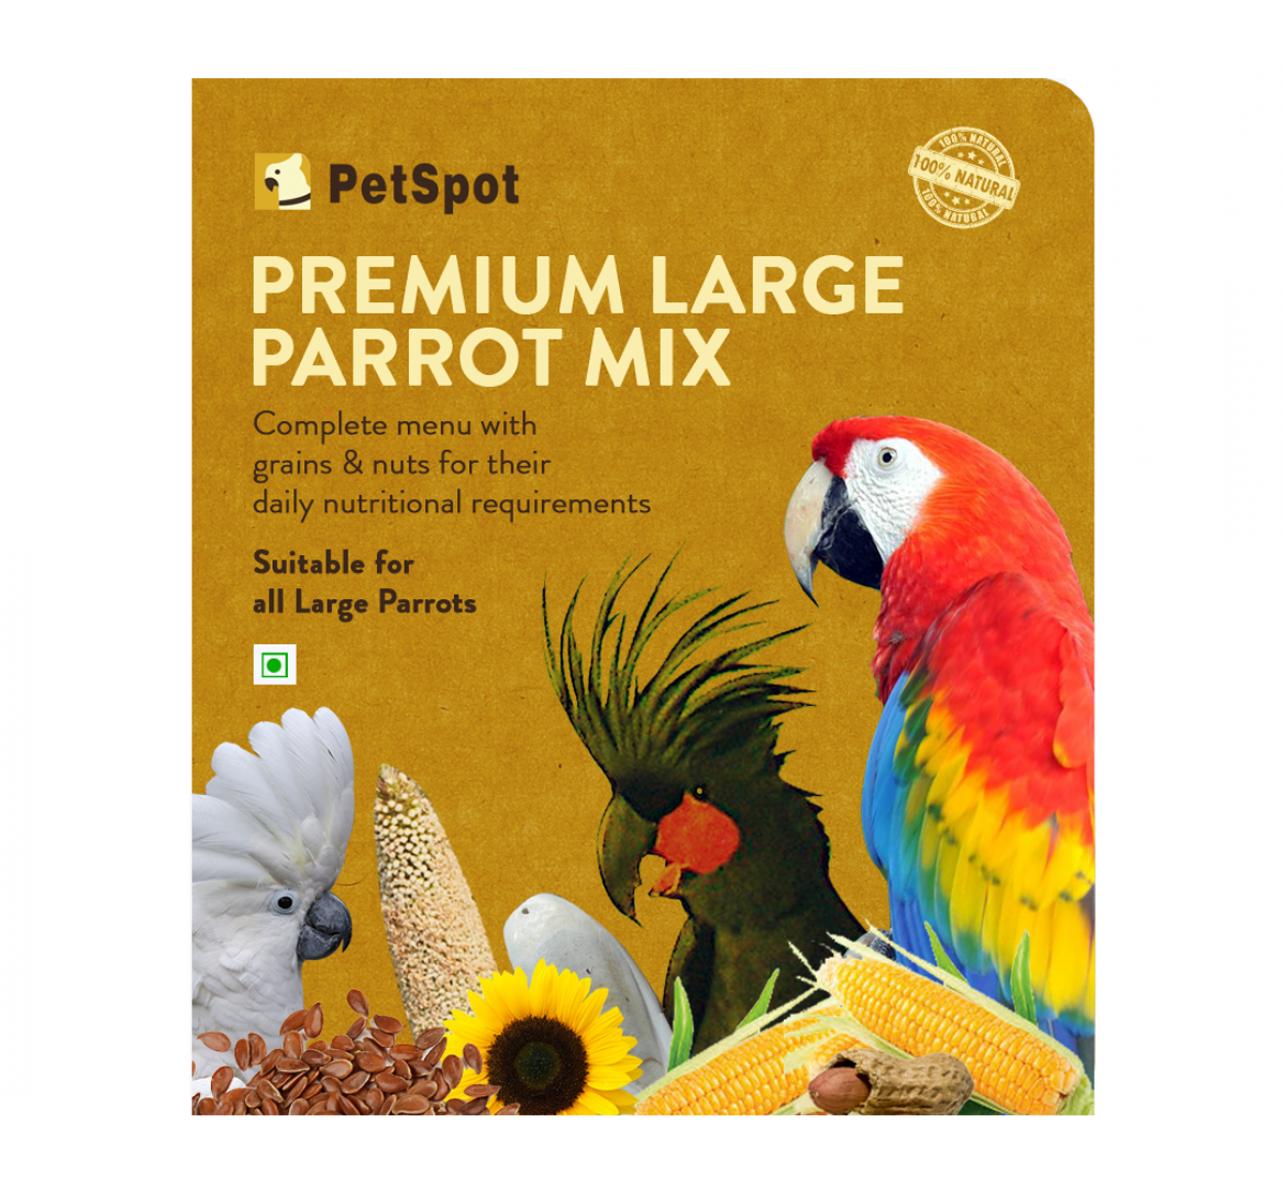 PetSpot Premium Large Parrot Mix - 400 gm